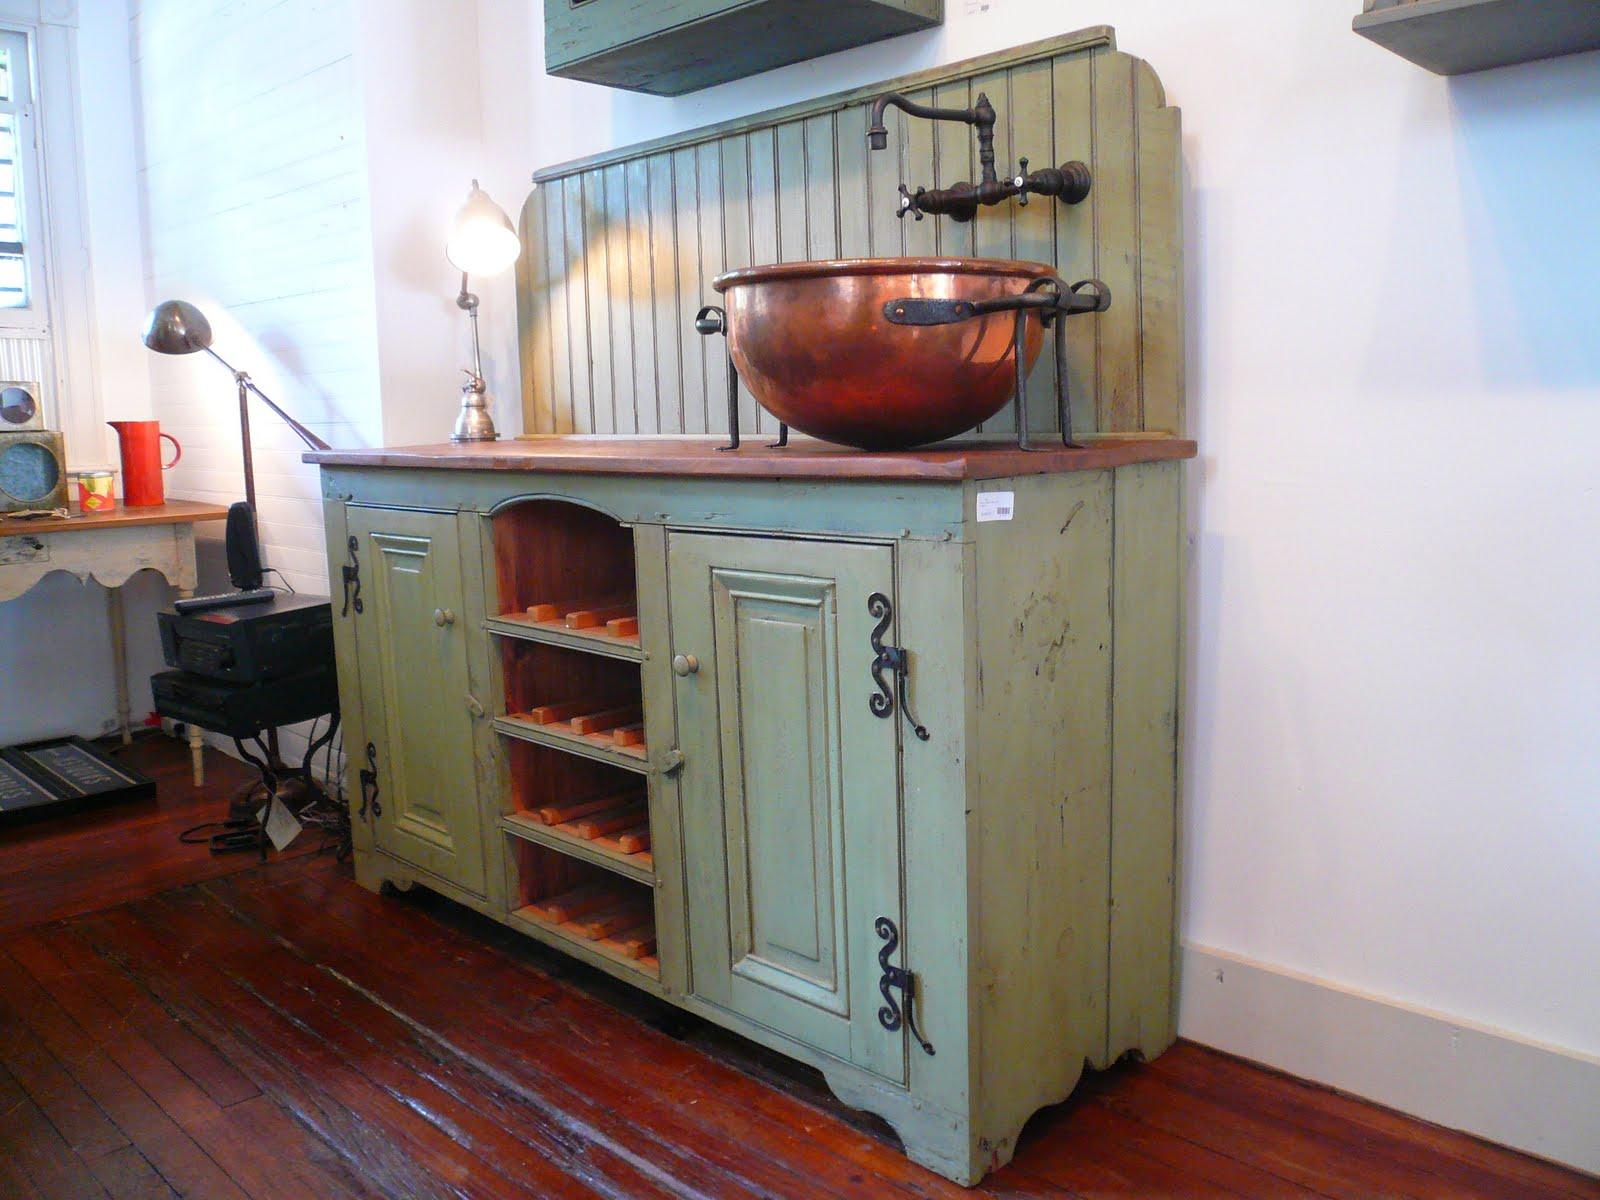 timeless kitchen cabinetry one of a kind wet bar. Black Bedroom Furniture Sets. Home Design Ideas